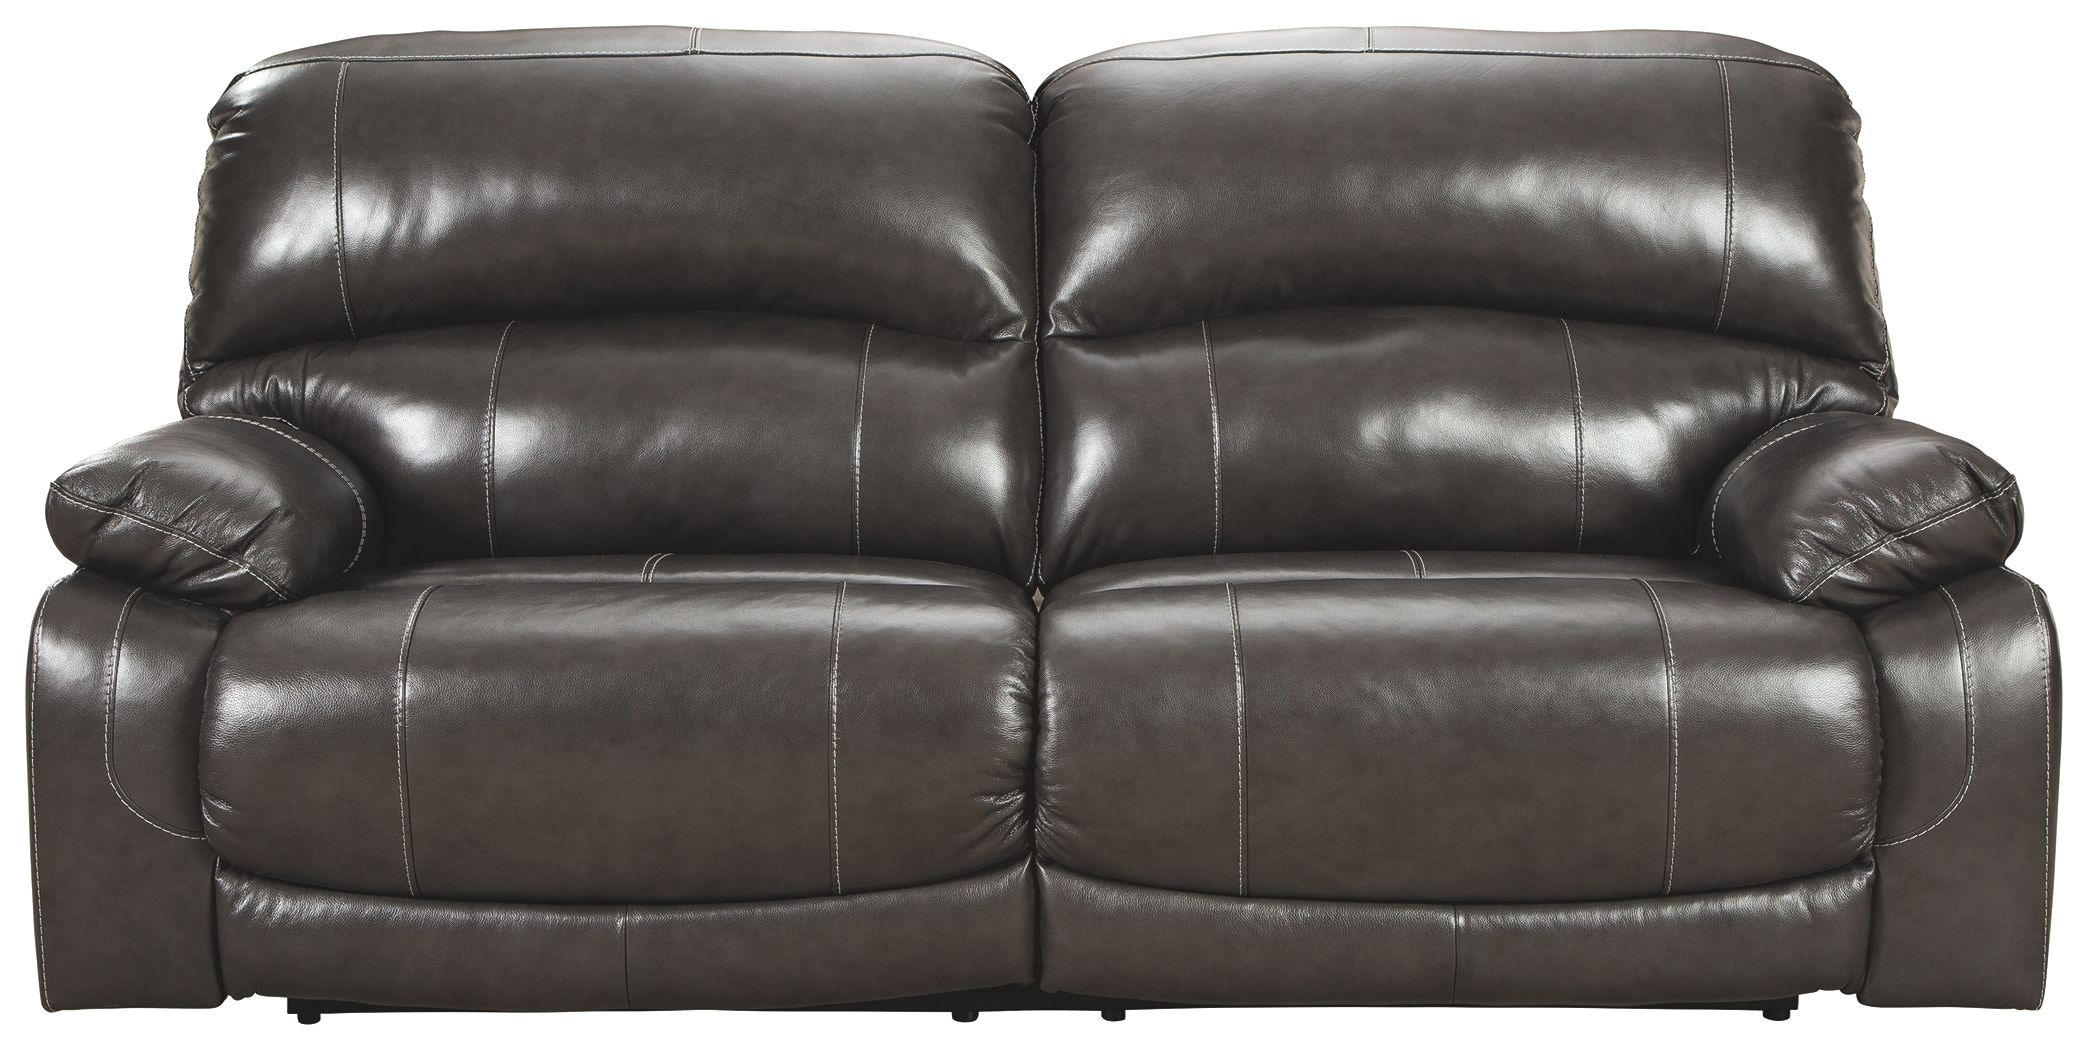 Signature Design By Ashley Living Room Hallstrung Power Reclining Sofa U5240347 Furniture Market